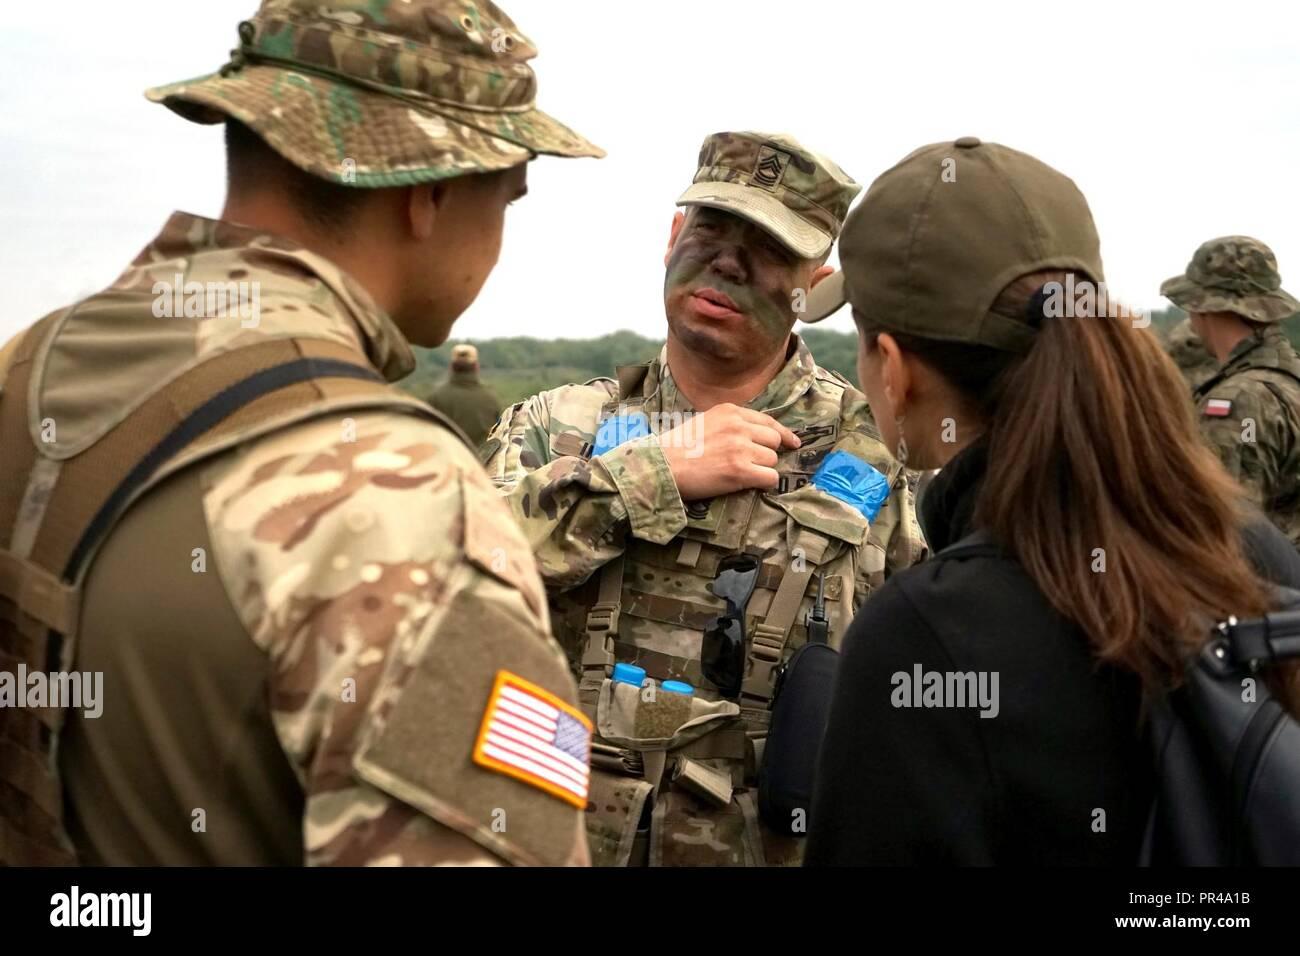 Ukrainian Army Military Flag Patch Tryzub Coat of Arms Camo Uniform